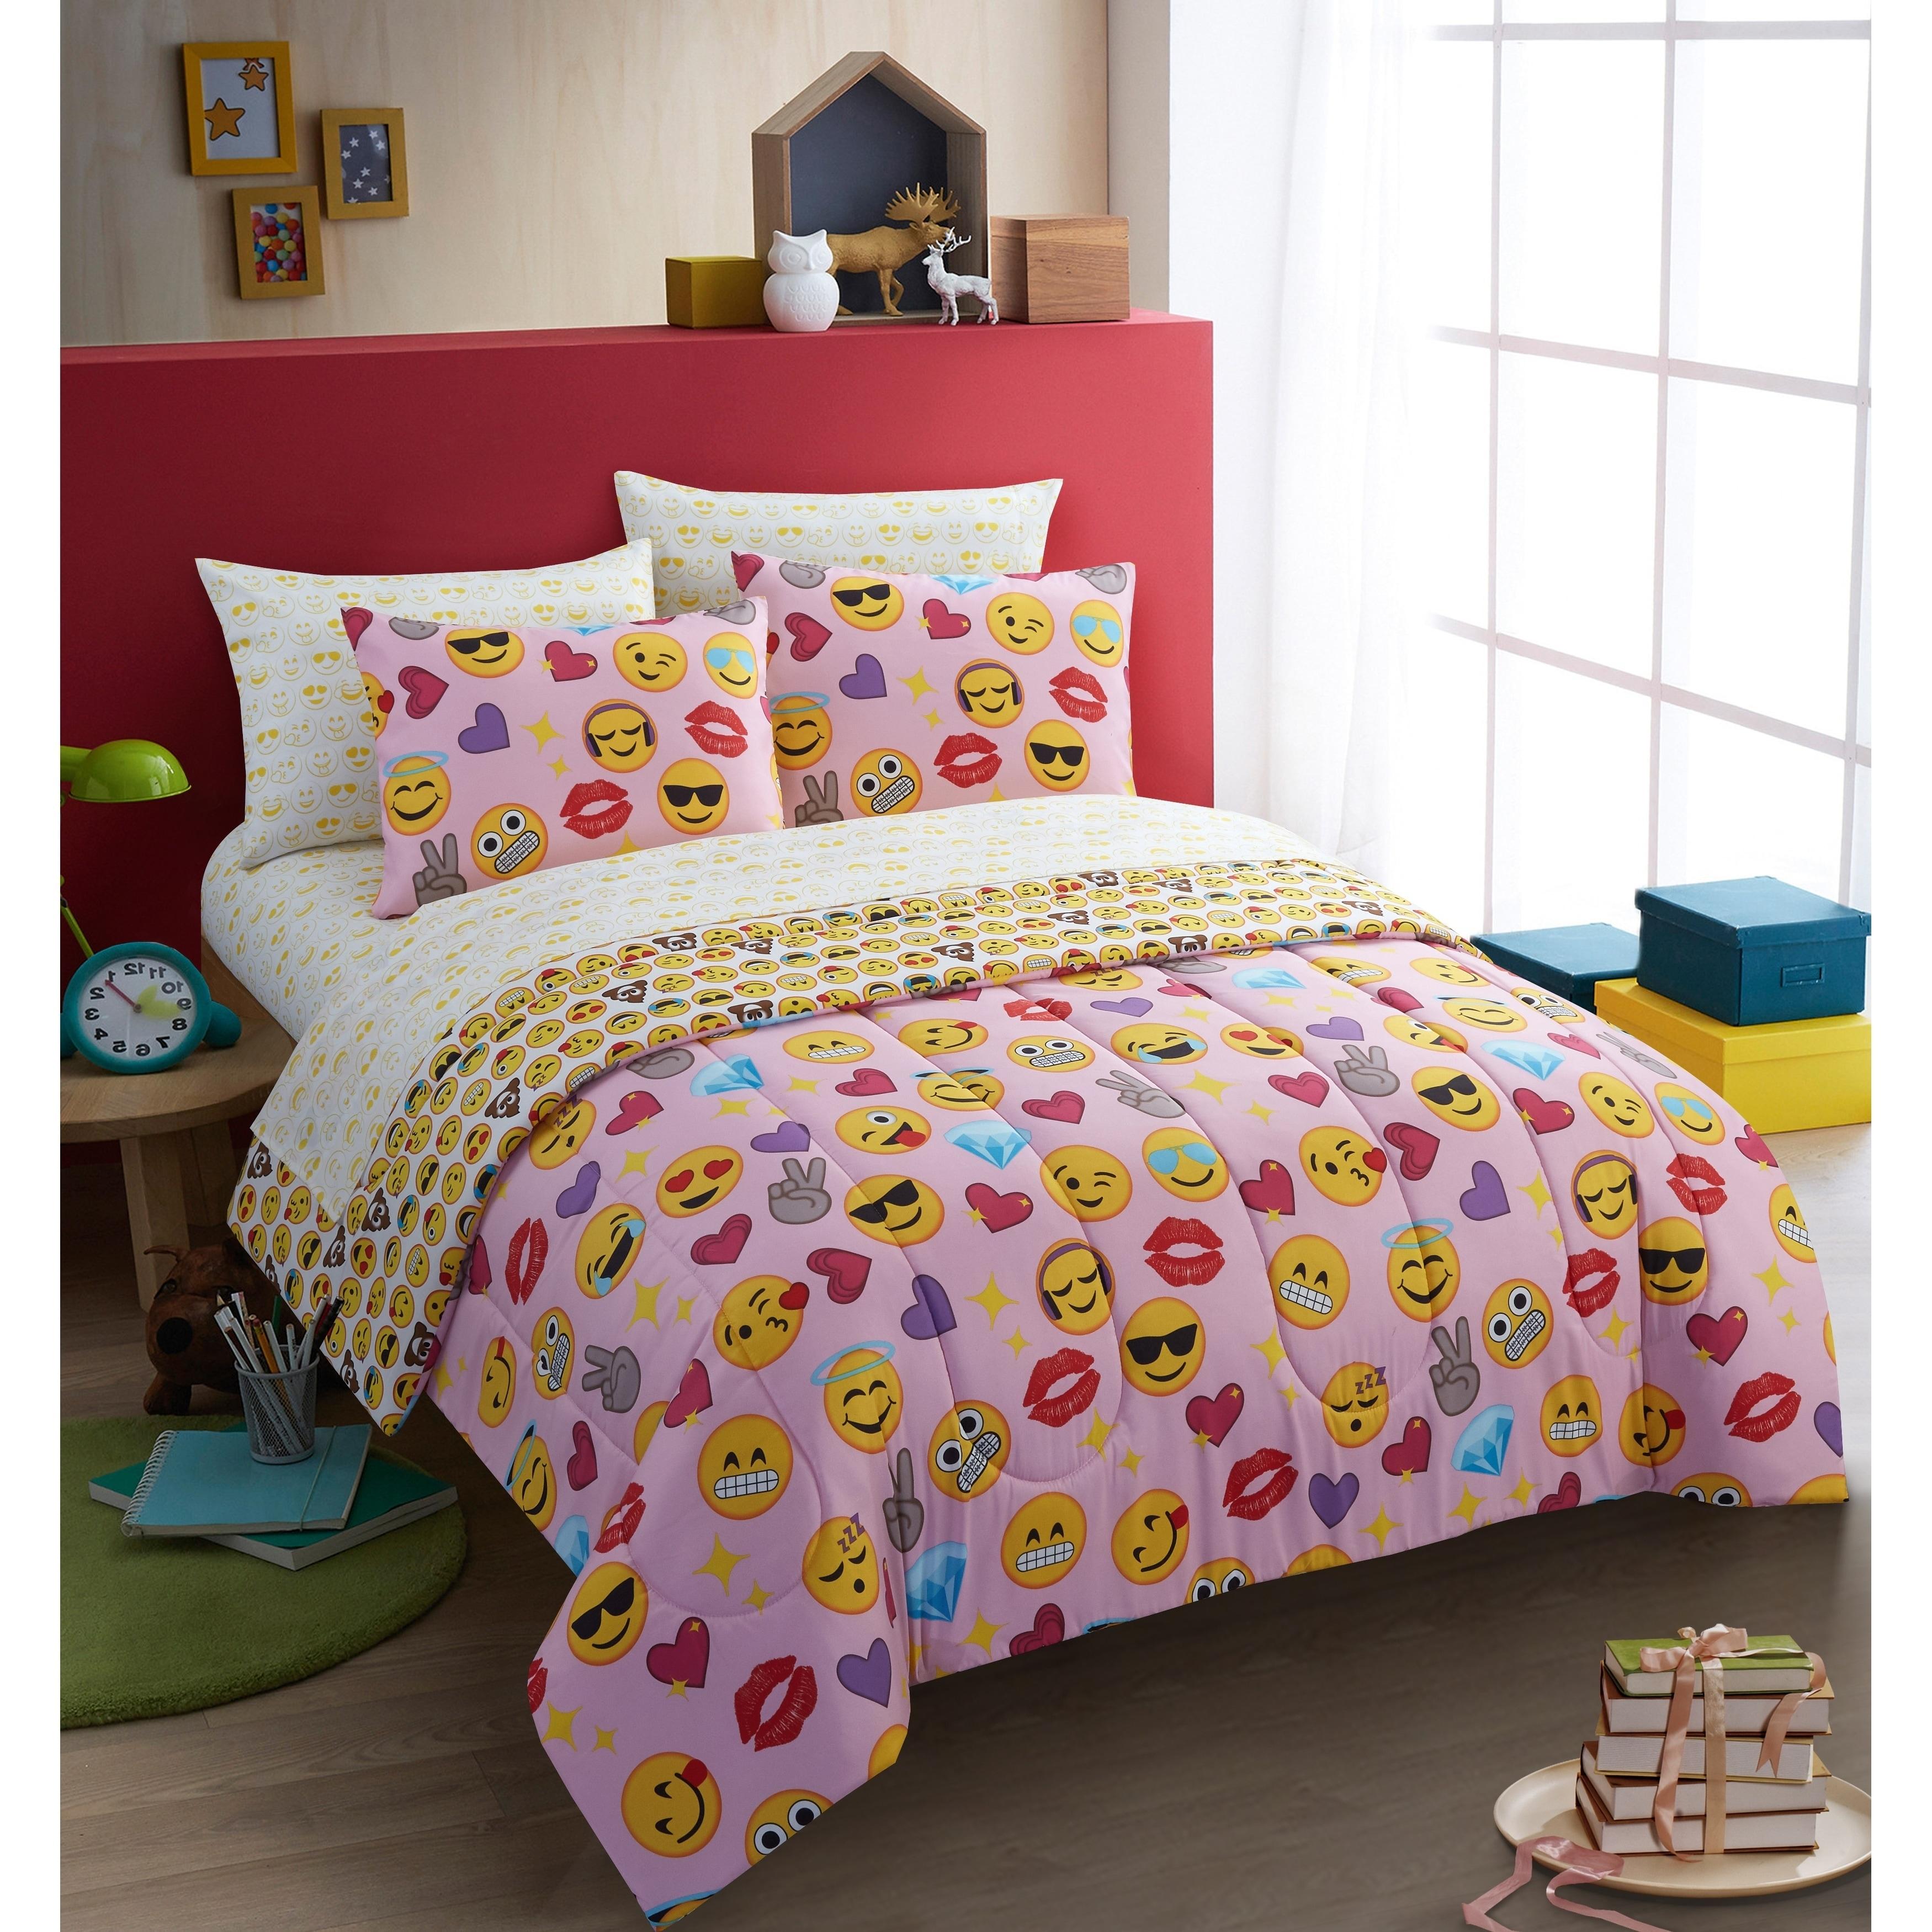 Twin XL Full Queen Bed Bag Emoji Faces Kiss Hearts Black 7pc Comforter Sheet Set